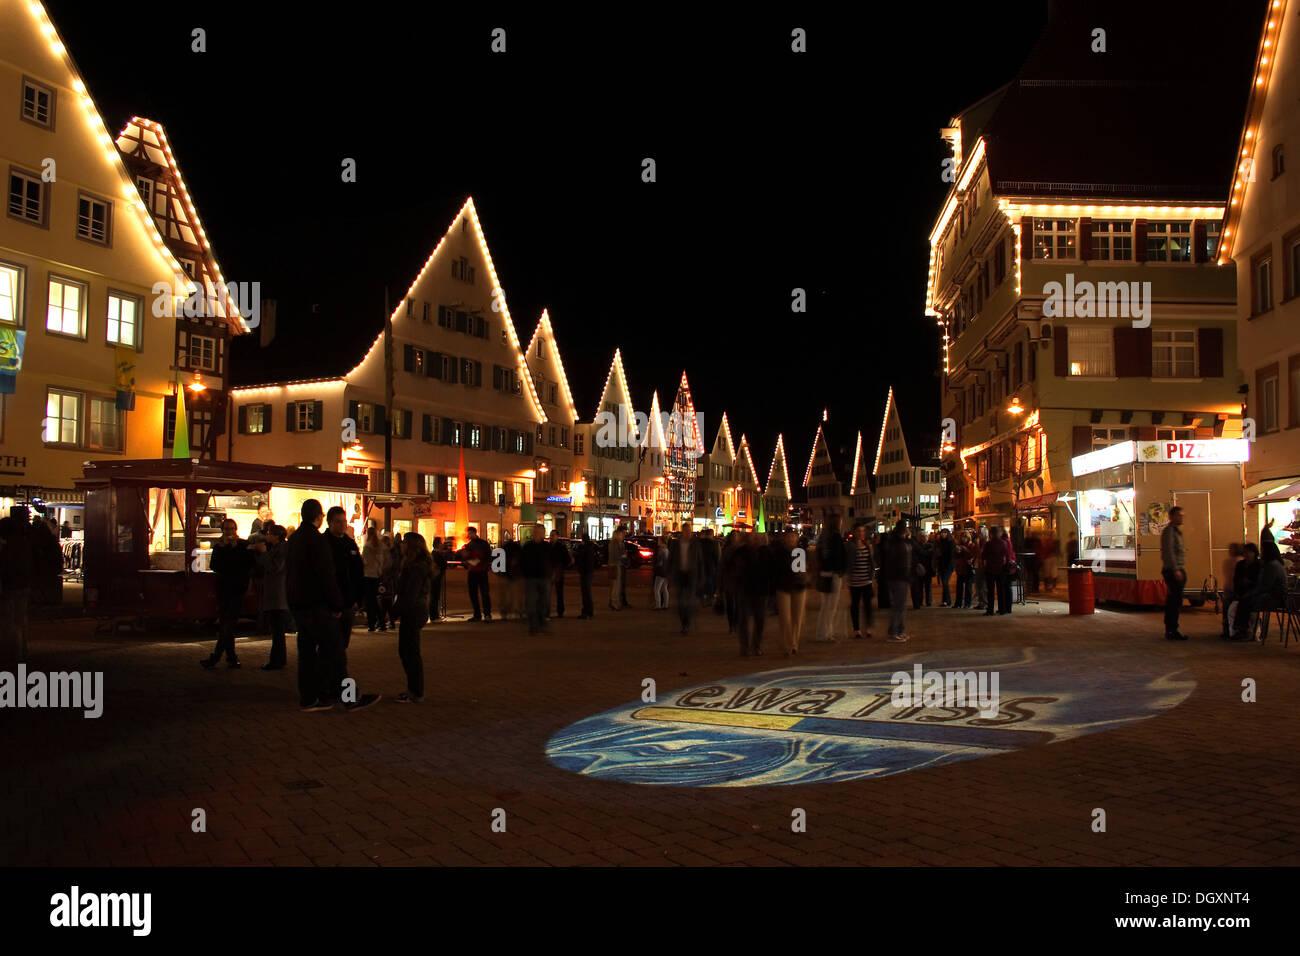 Spotlighted ground, ewa.riss electricity distributor advertising, market square, Biberach an der Riss, Upper Swabia - Stock Image